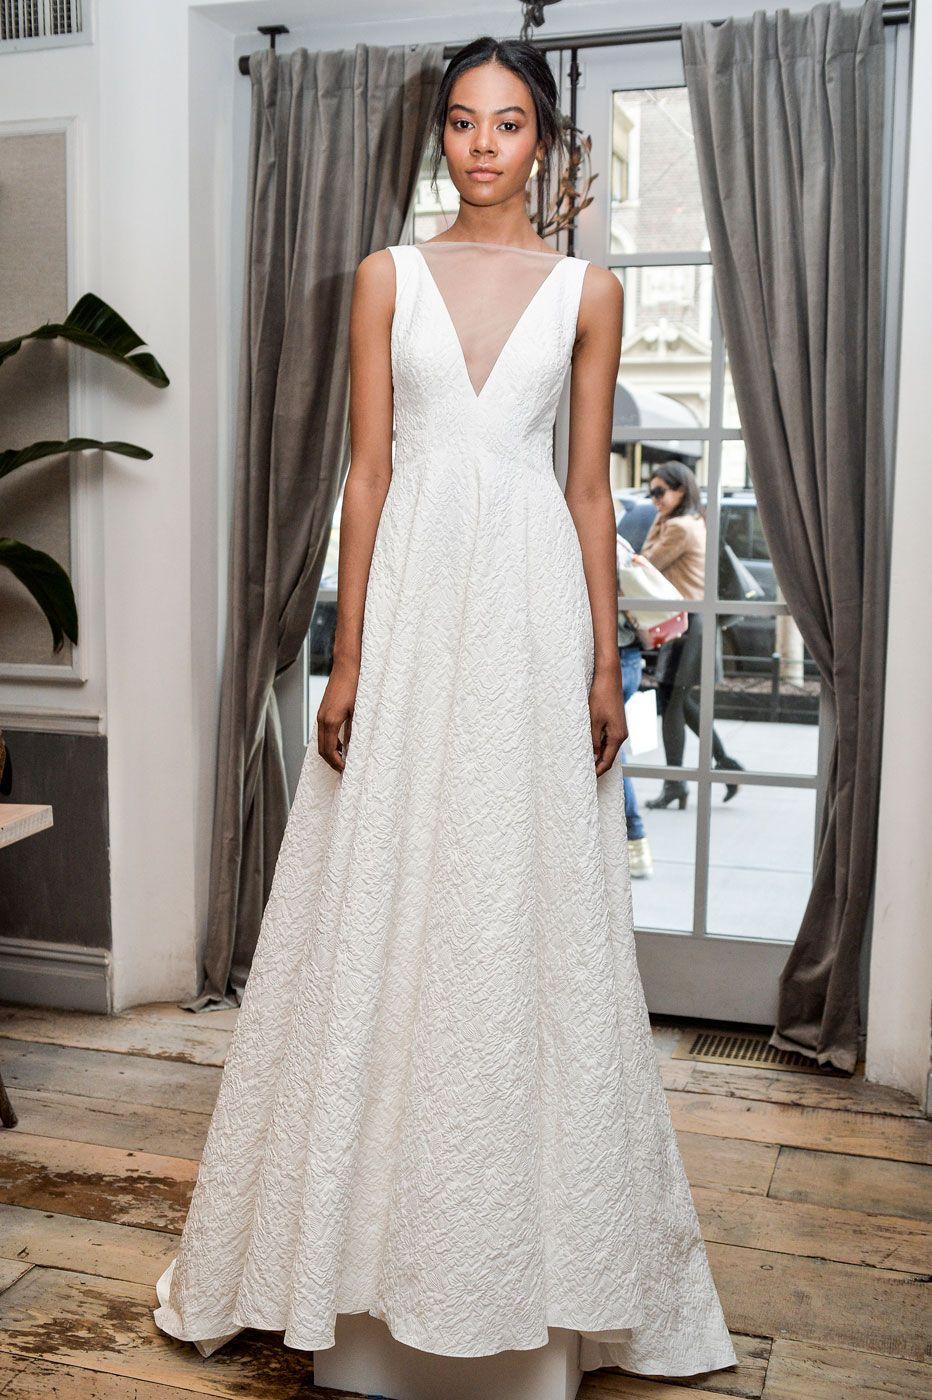 Bridal trend report   Lela rose, Wedding dress trends and Wedding bells